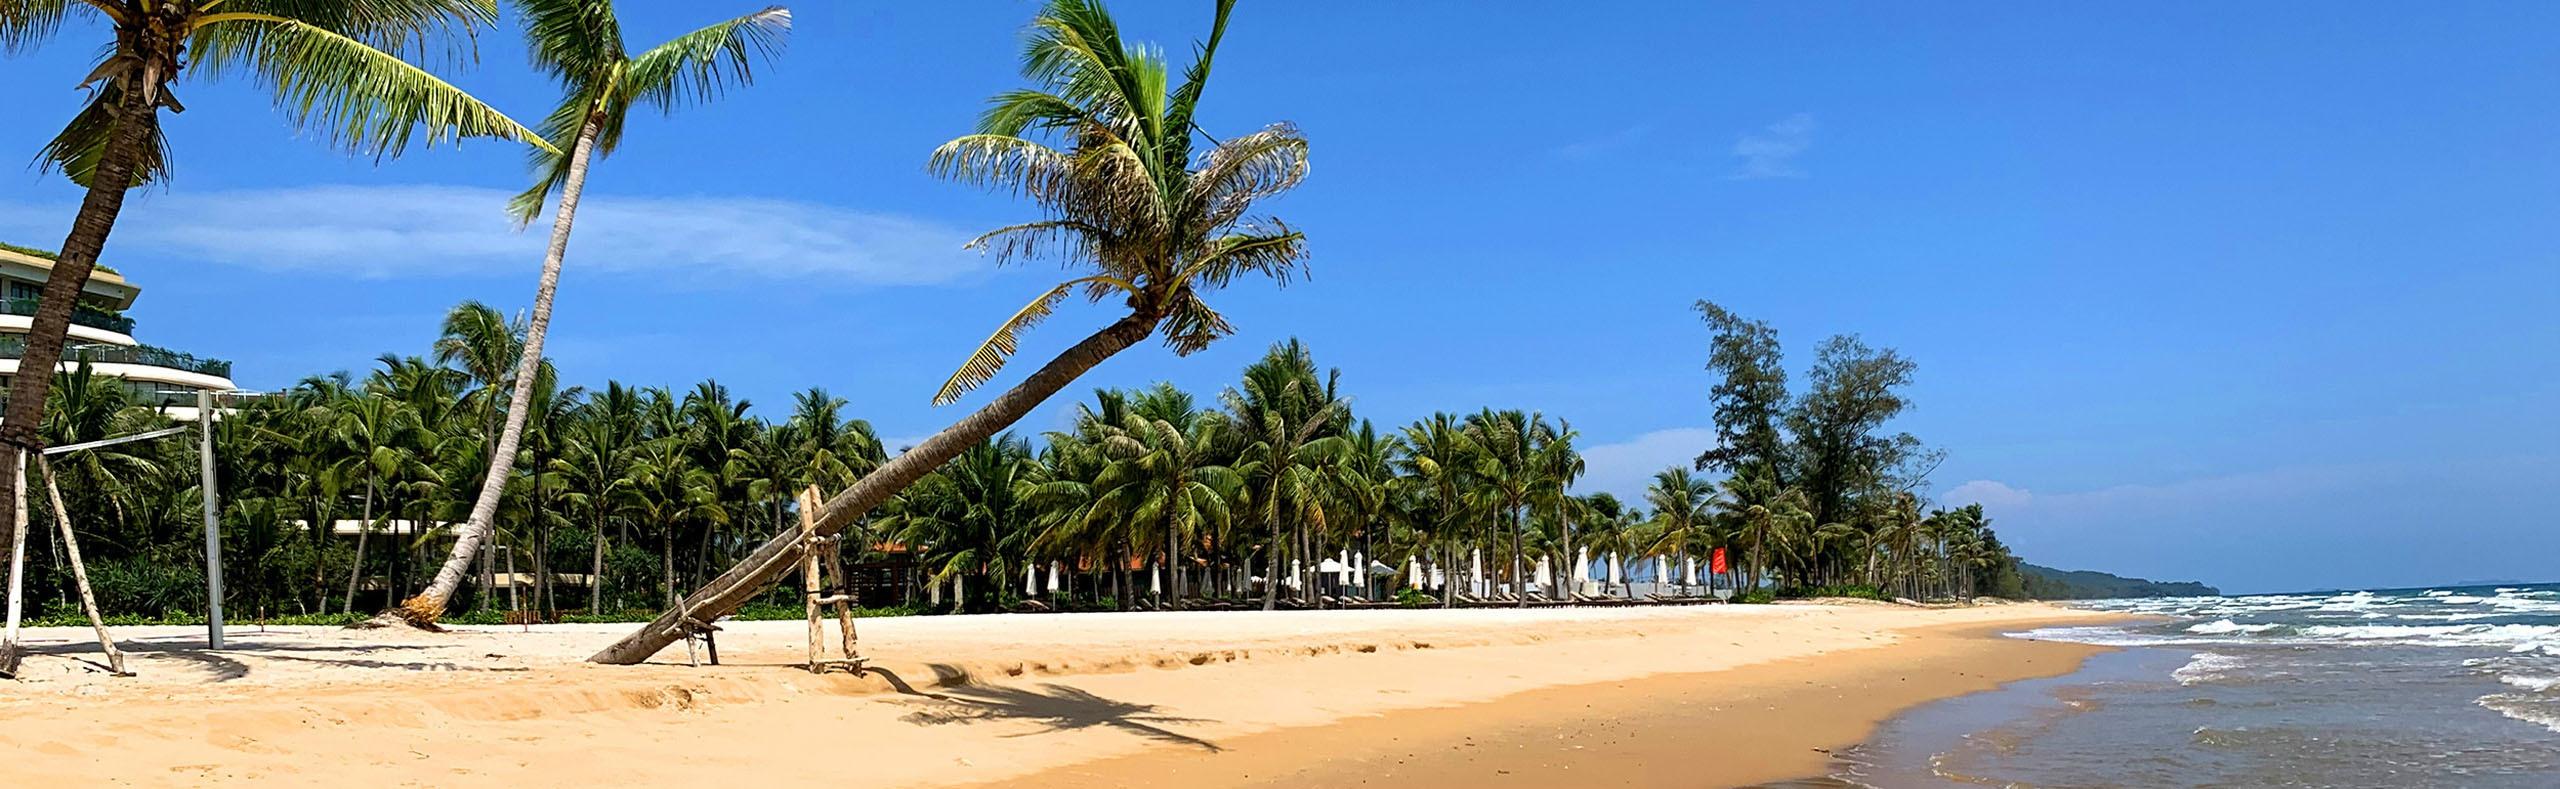 Top Beach Resorts in Vietnam - Best-value Resorts